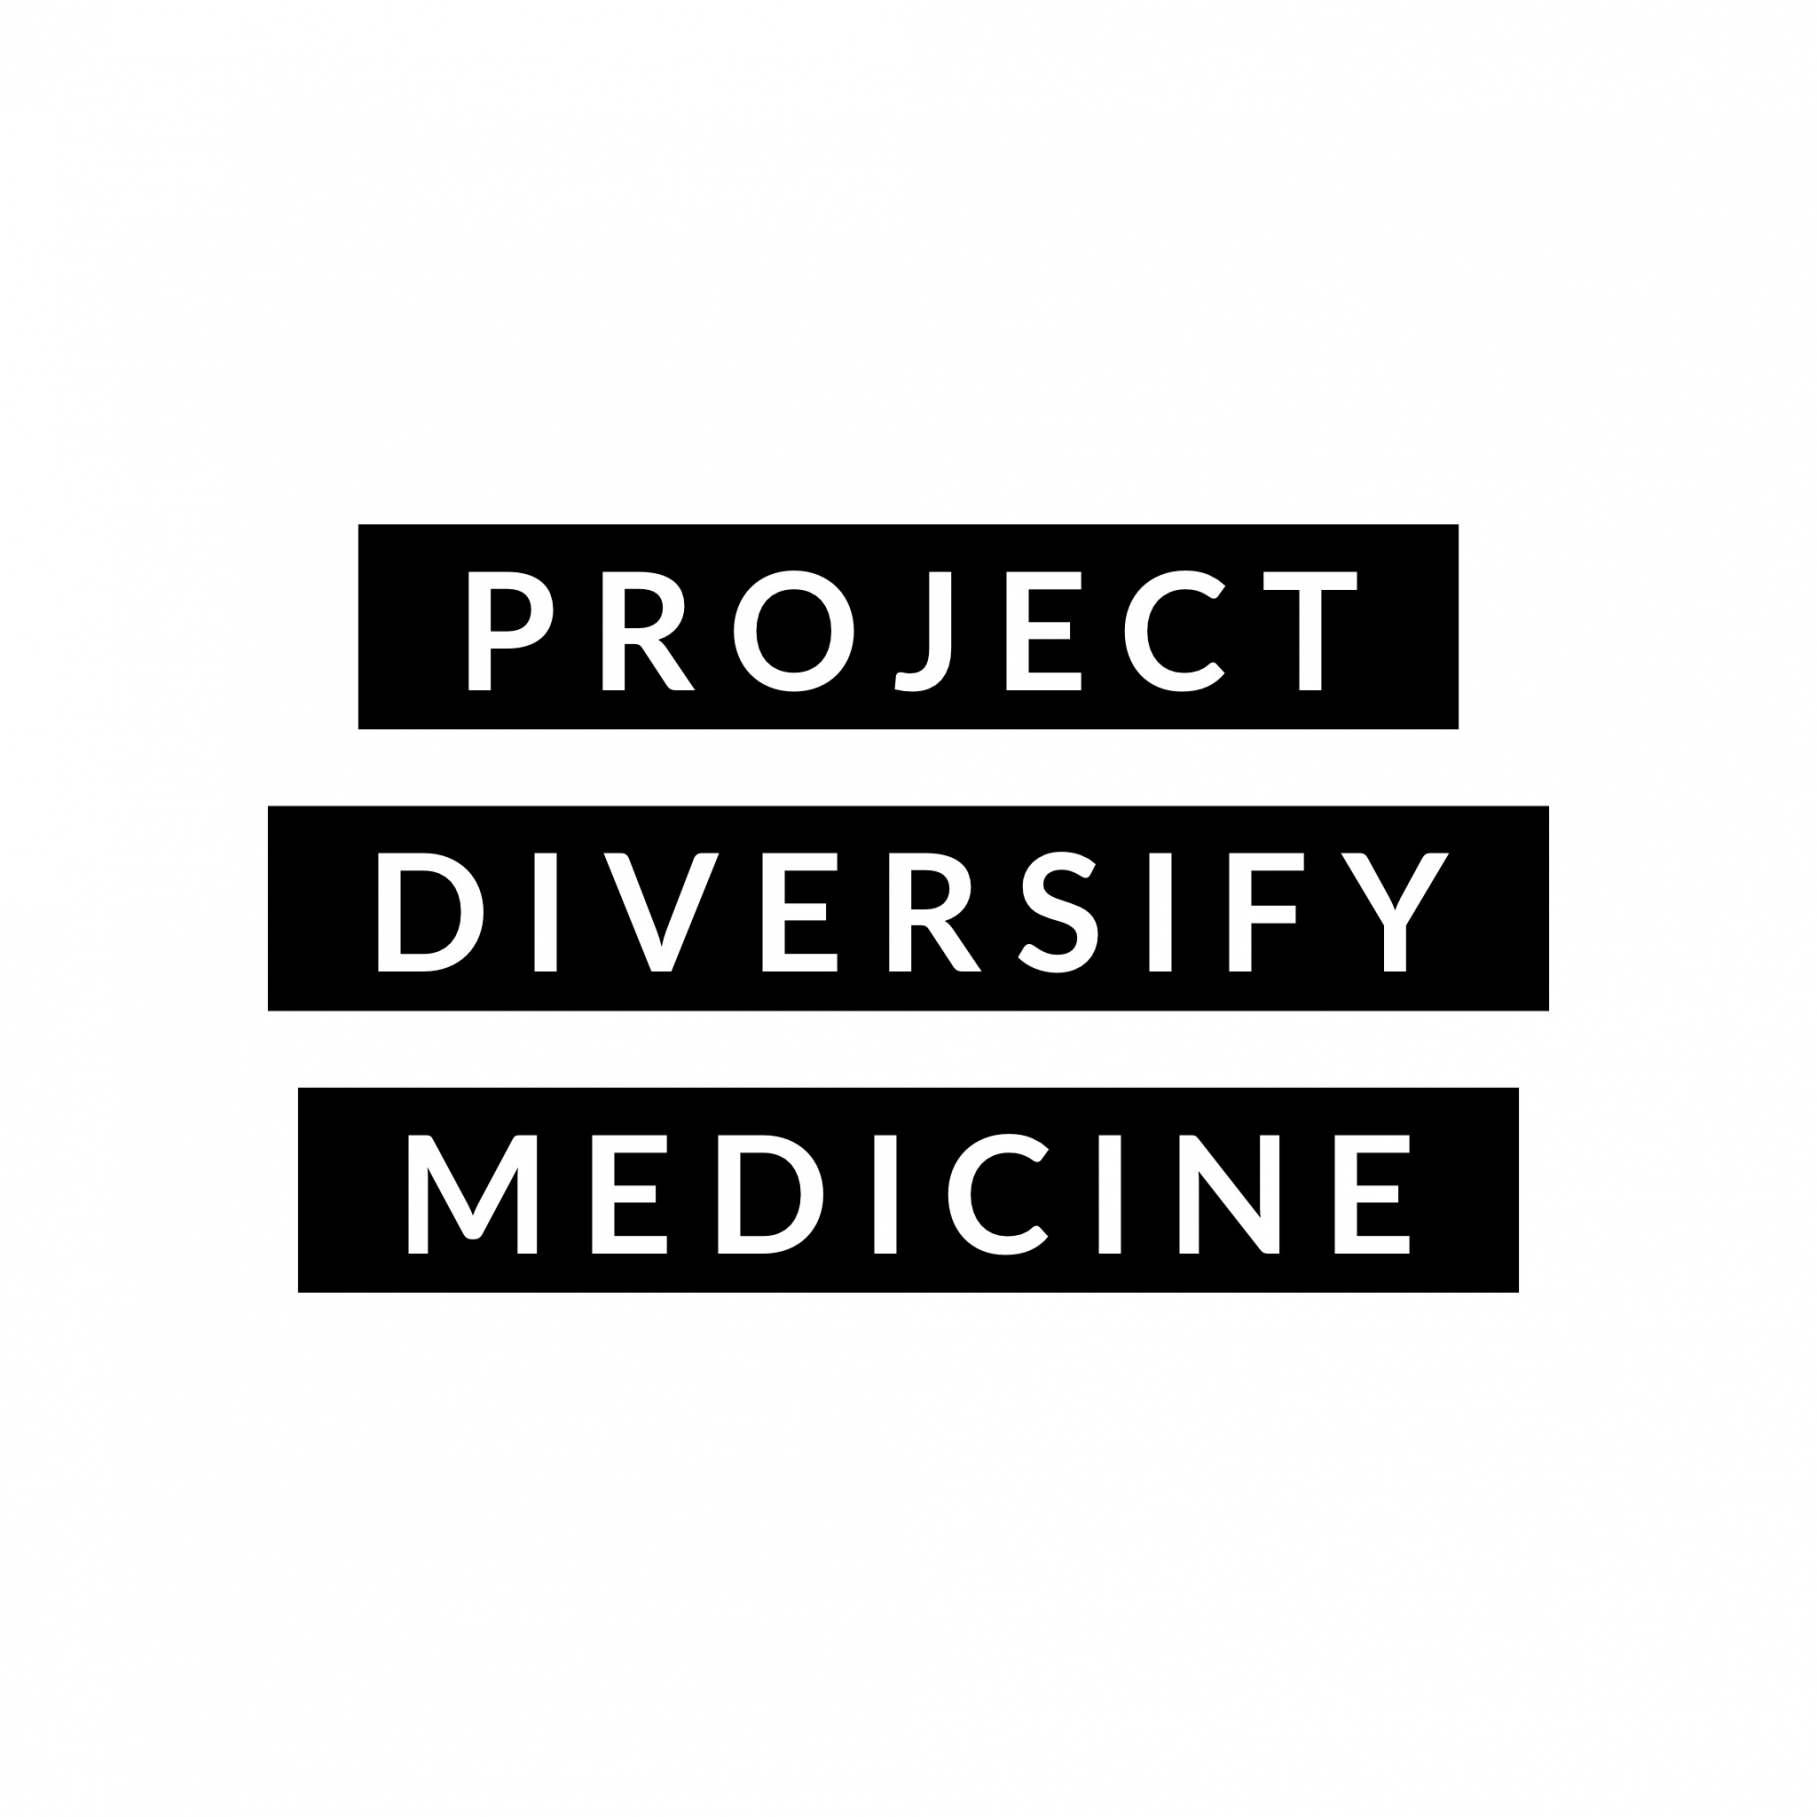 Project Diversify Medicine